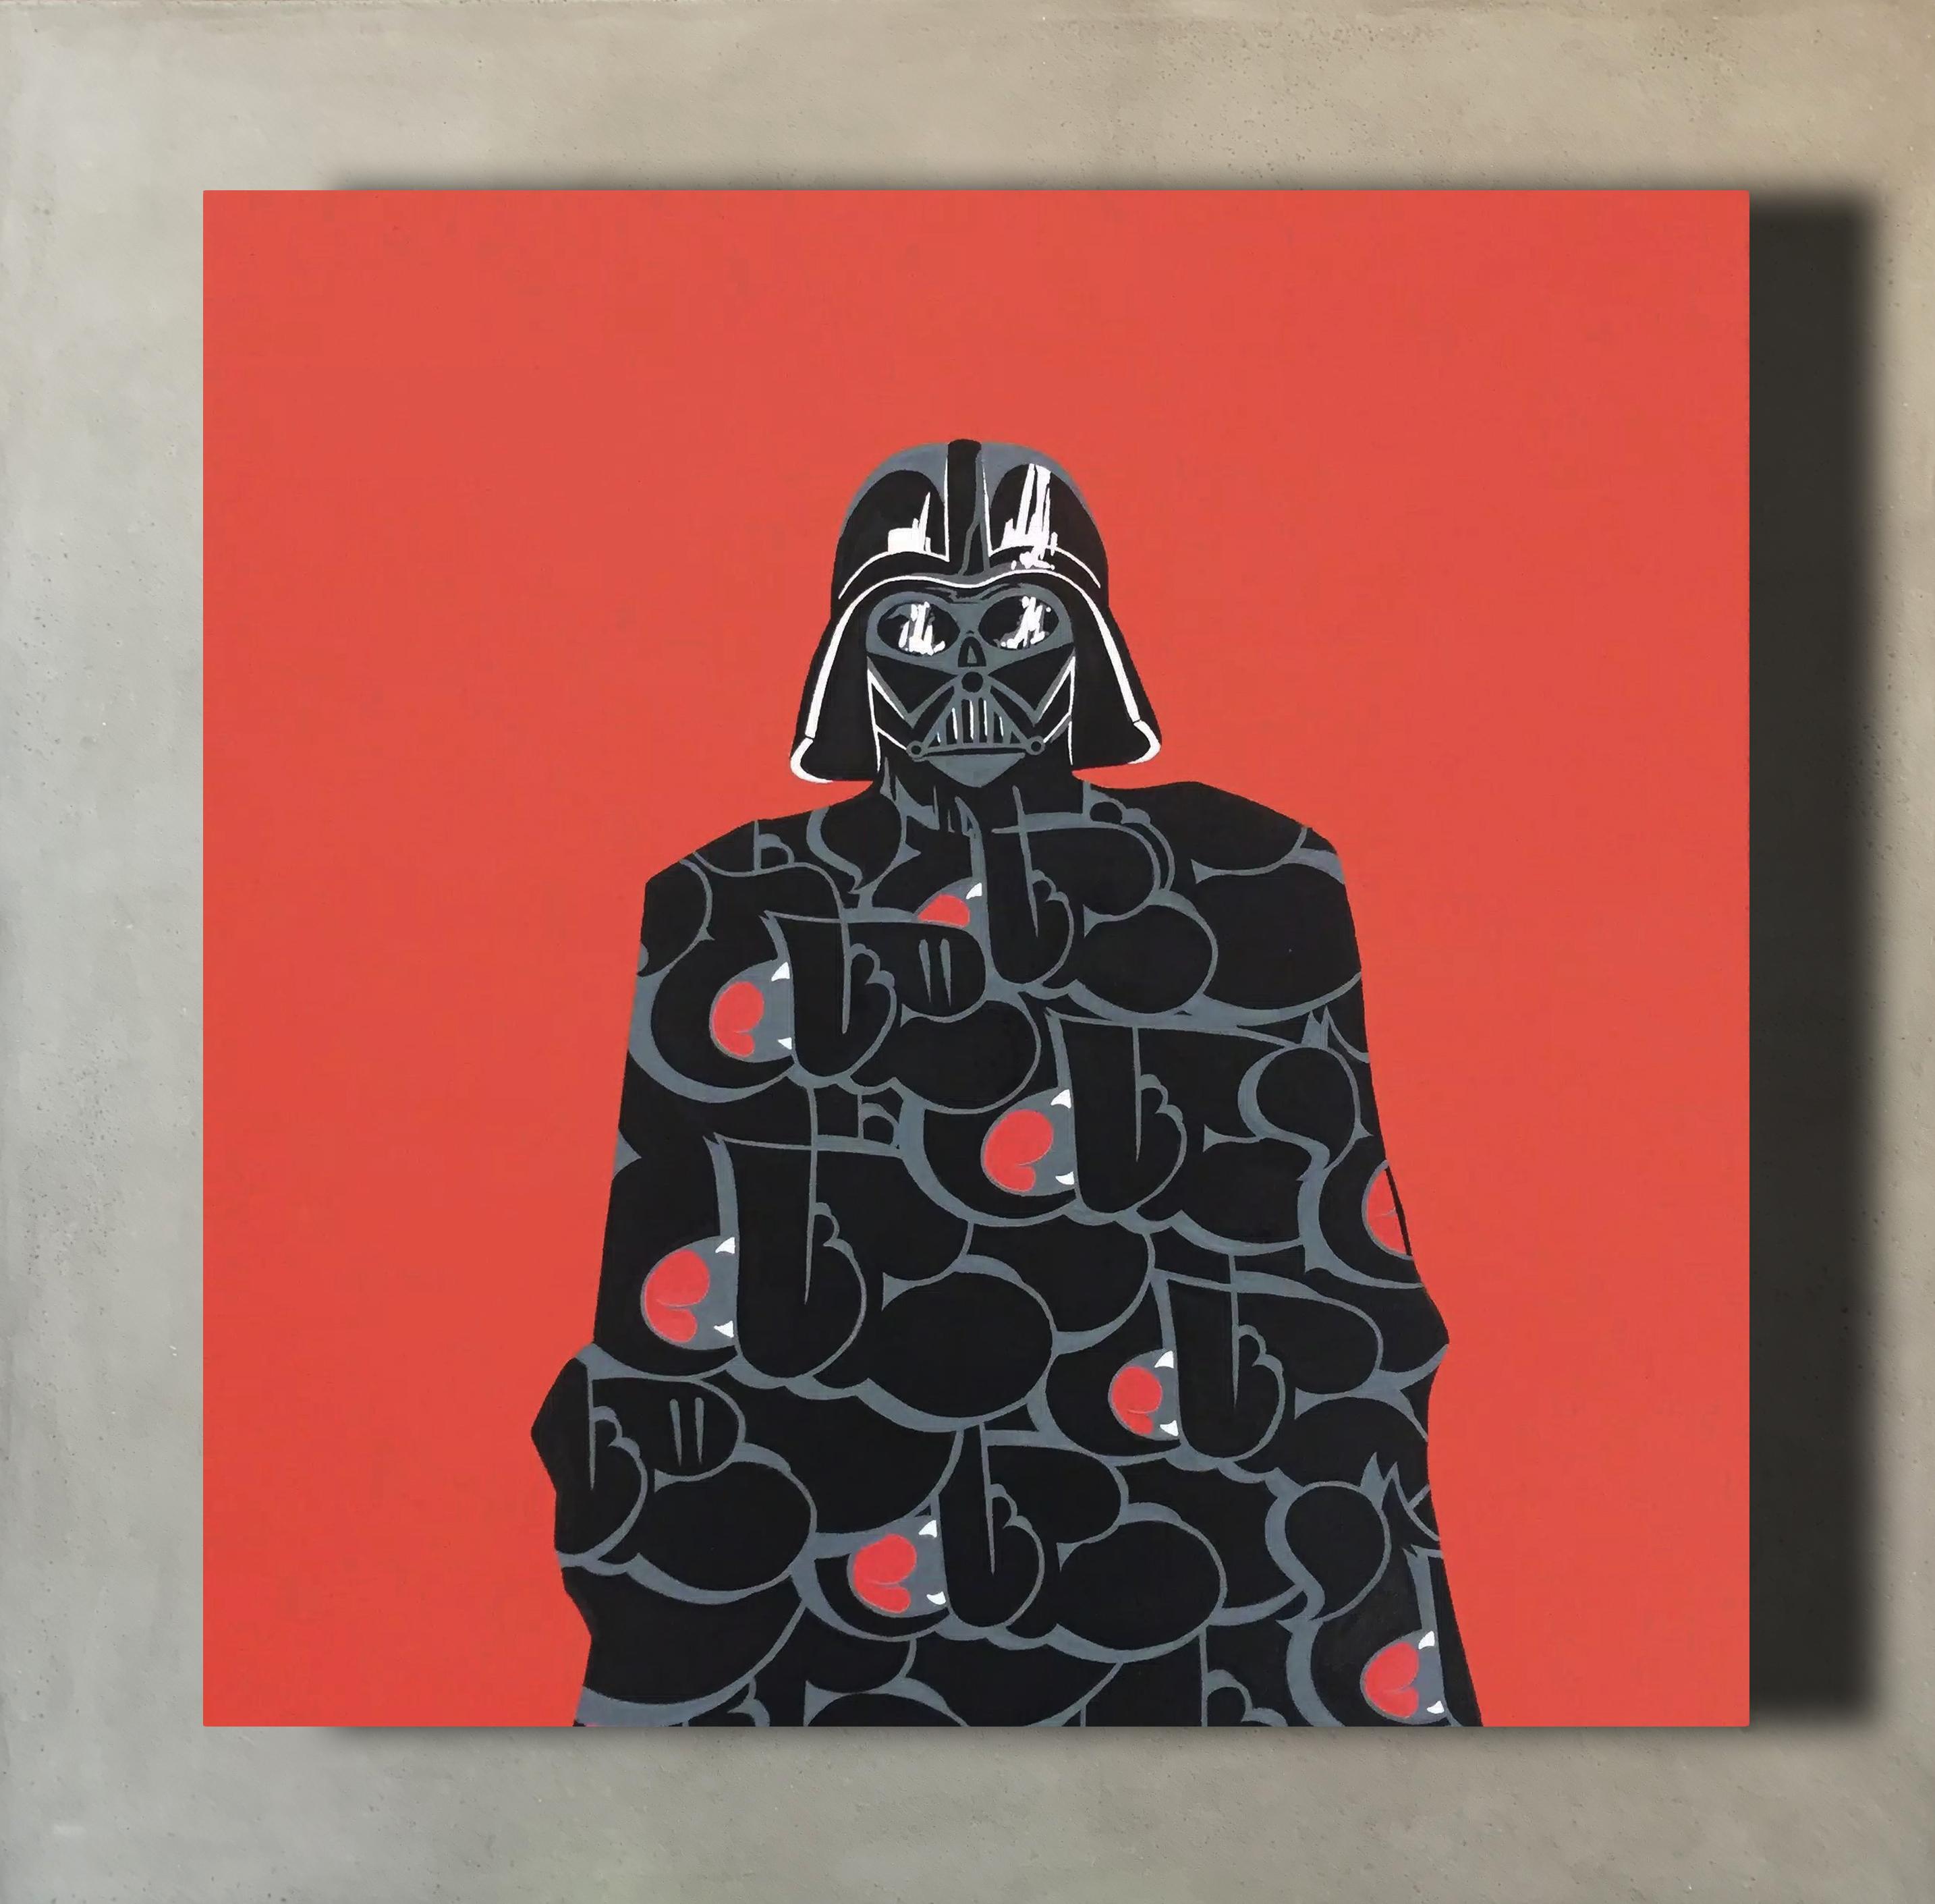 "Darth Vader x Nover, 24x24"" Acrylic on Canvas, 2016."